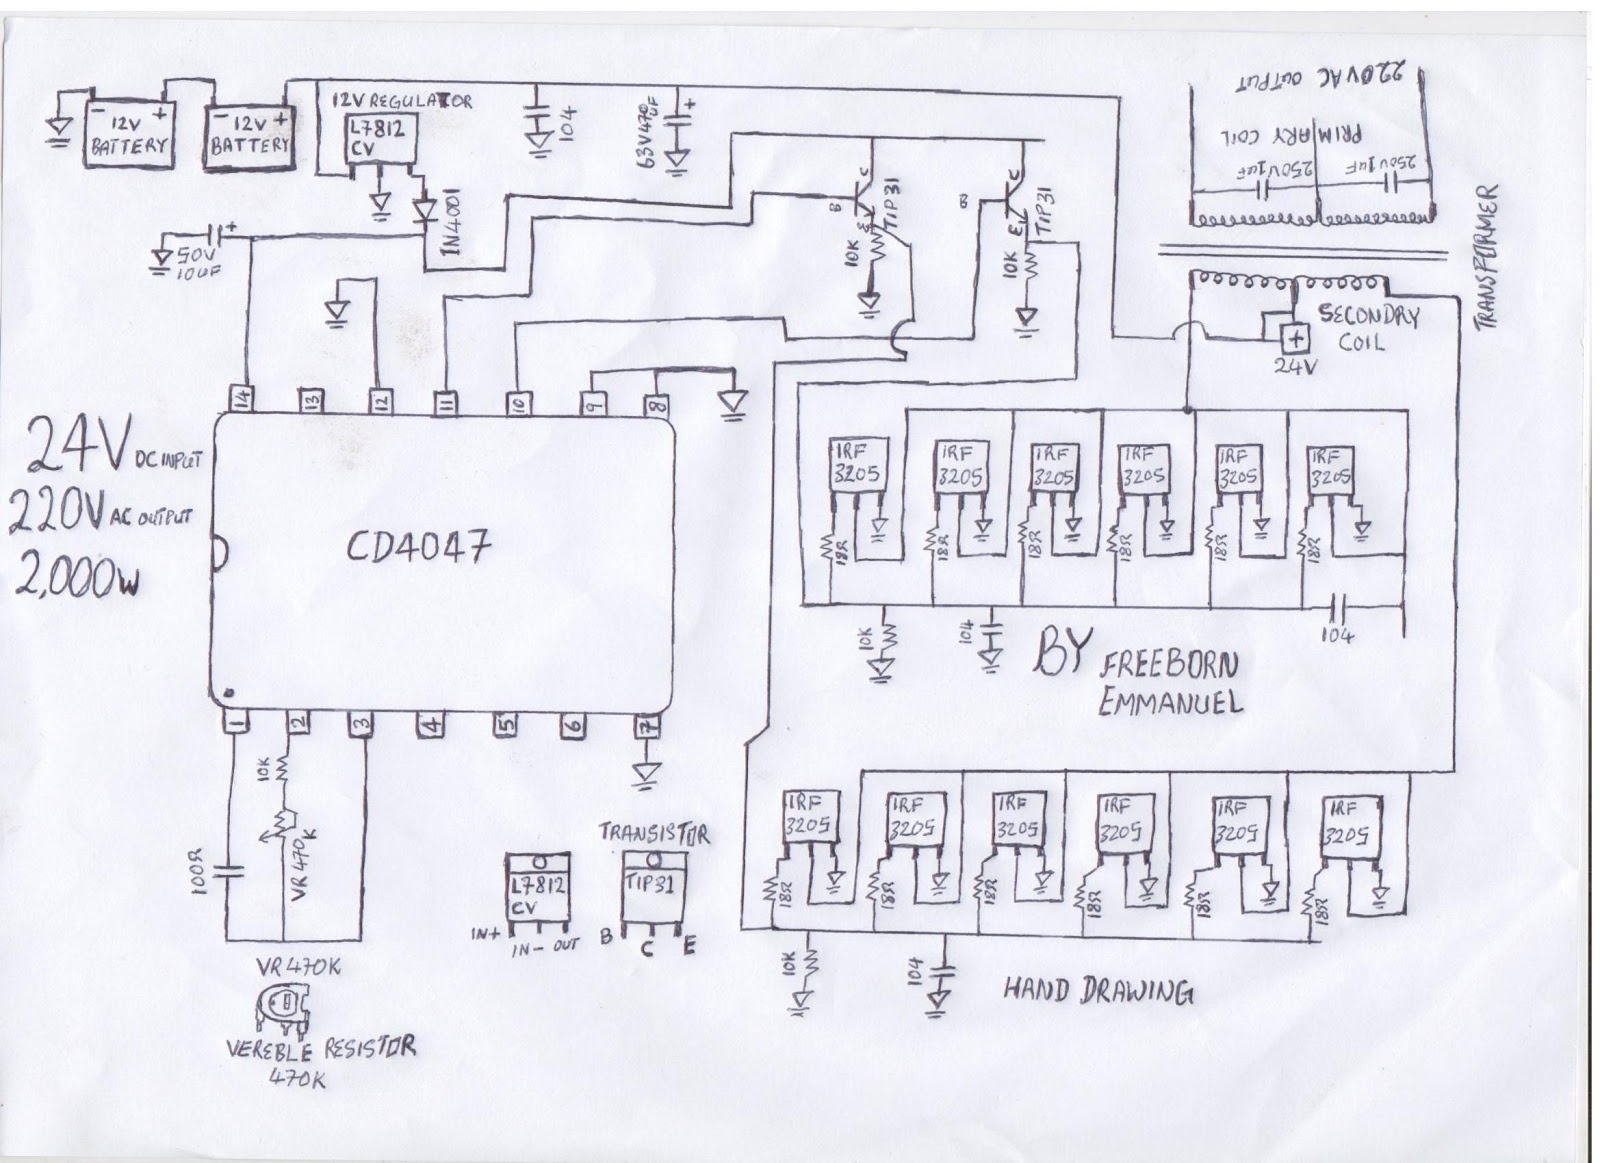 hight resolution of 2000 watt inverter circuit diagram wiring diagram for you 2000w power inverter circuit diagram 2000w inverter wiring diagram